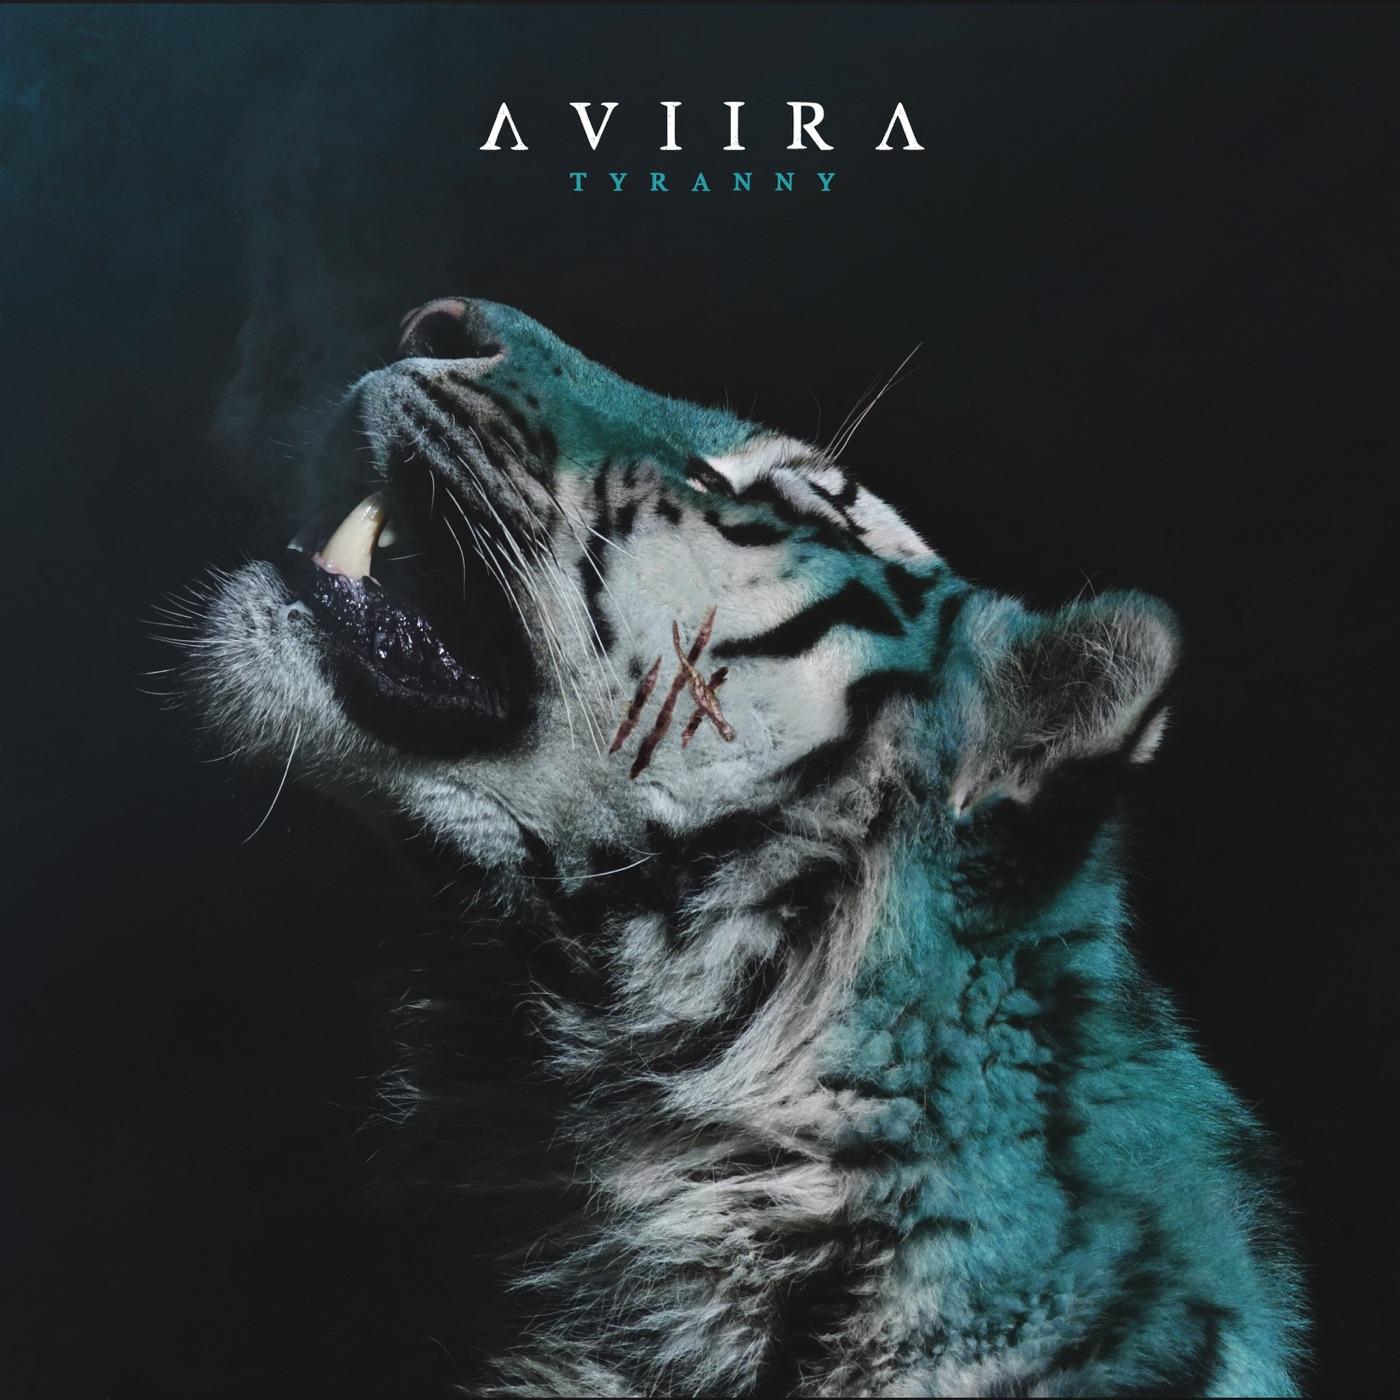 Aviira - Tyranny [Single] (2018)